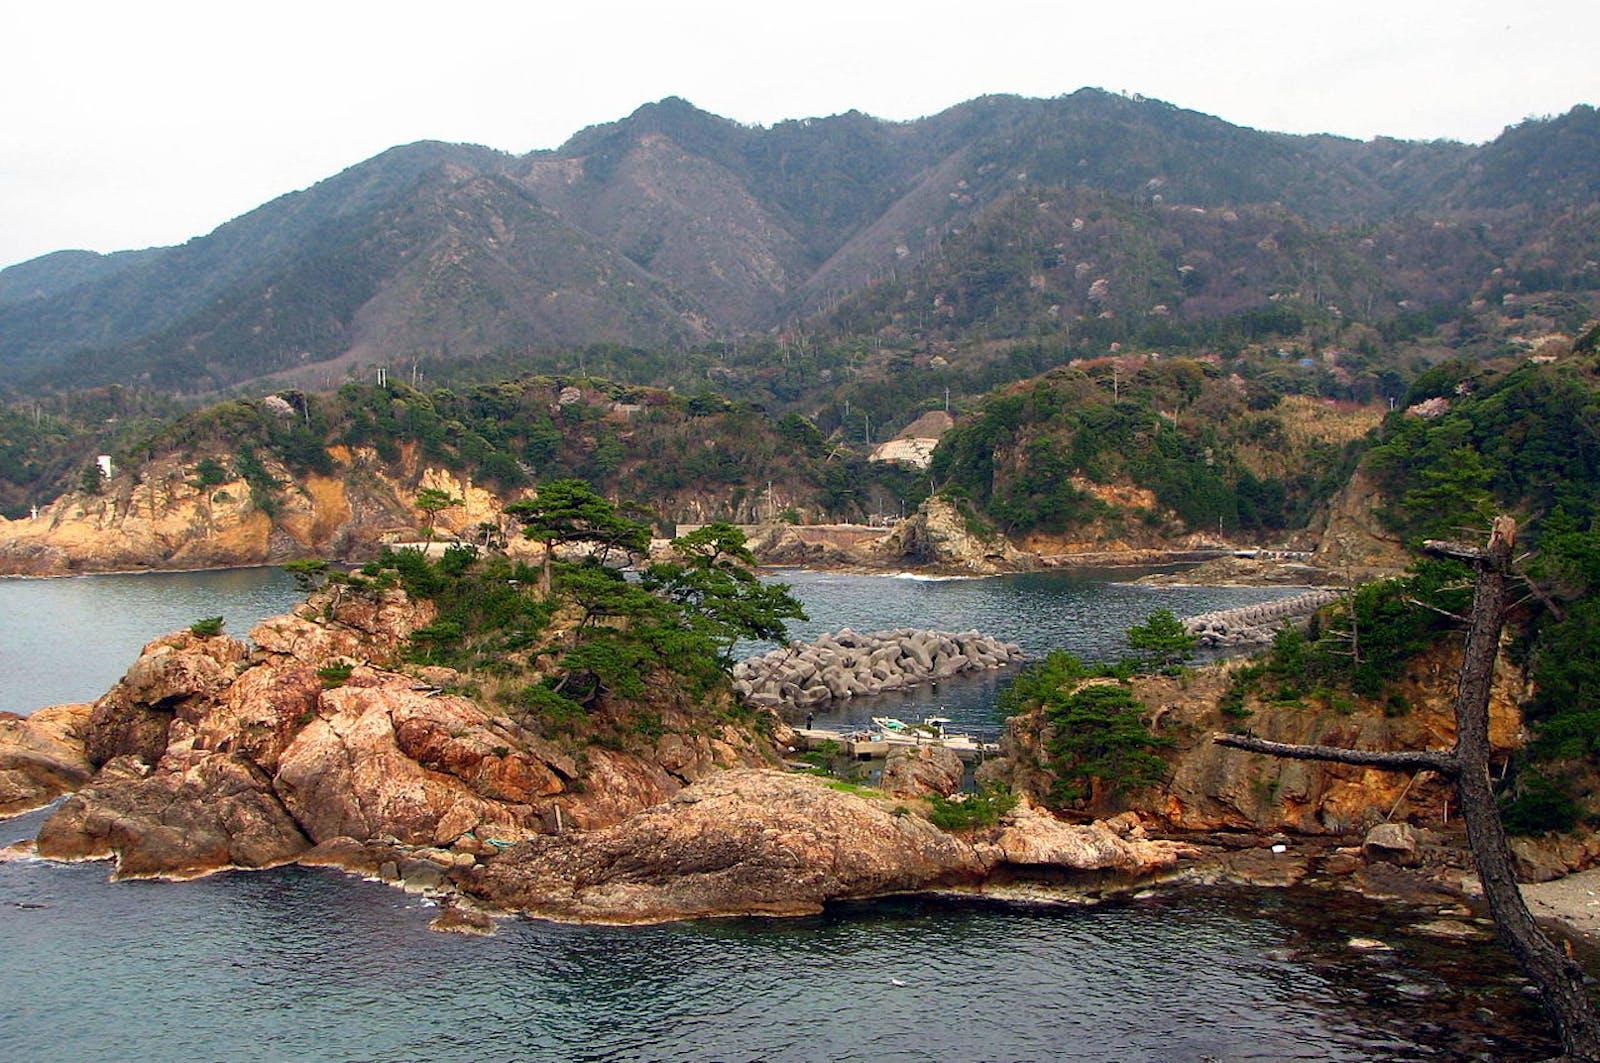 Nihonkai Evergreen Forests